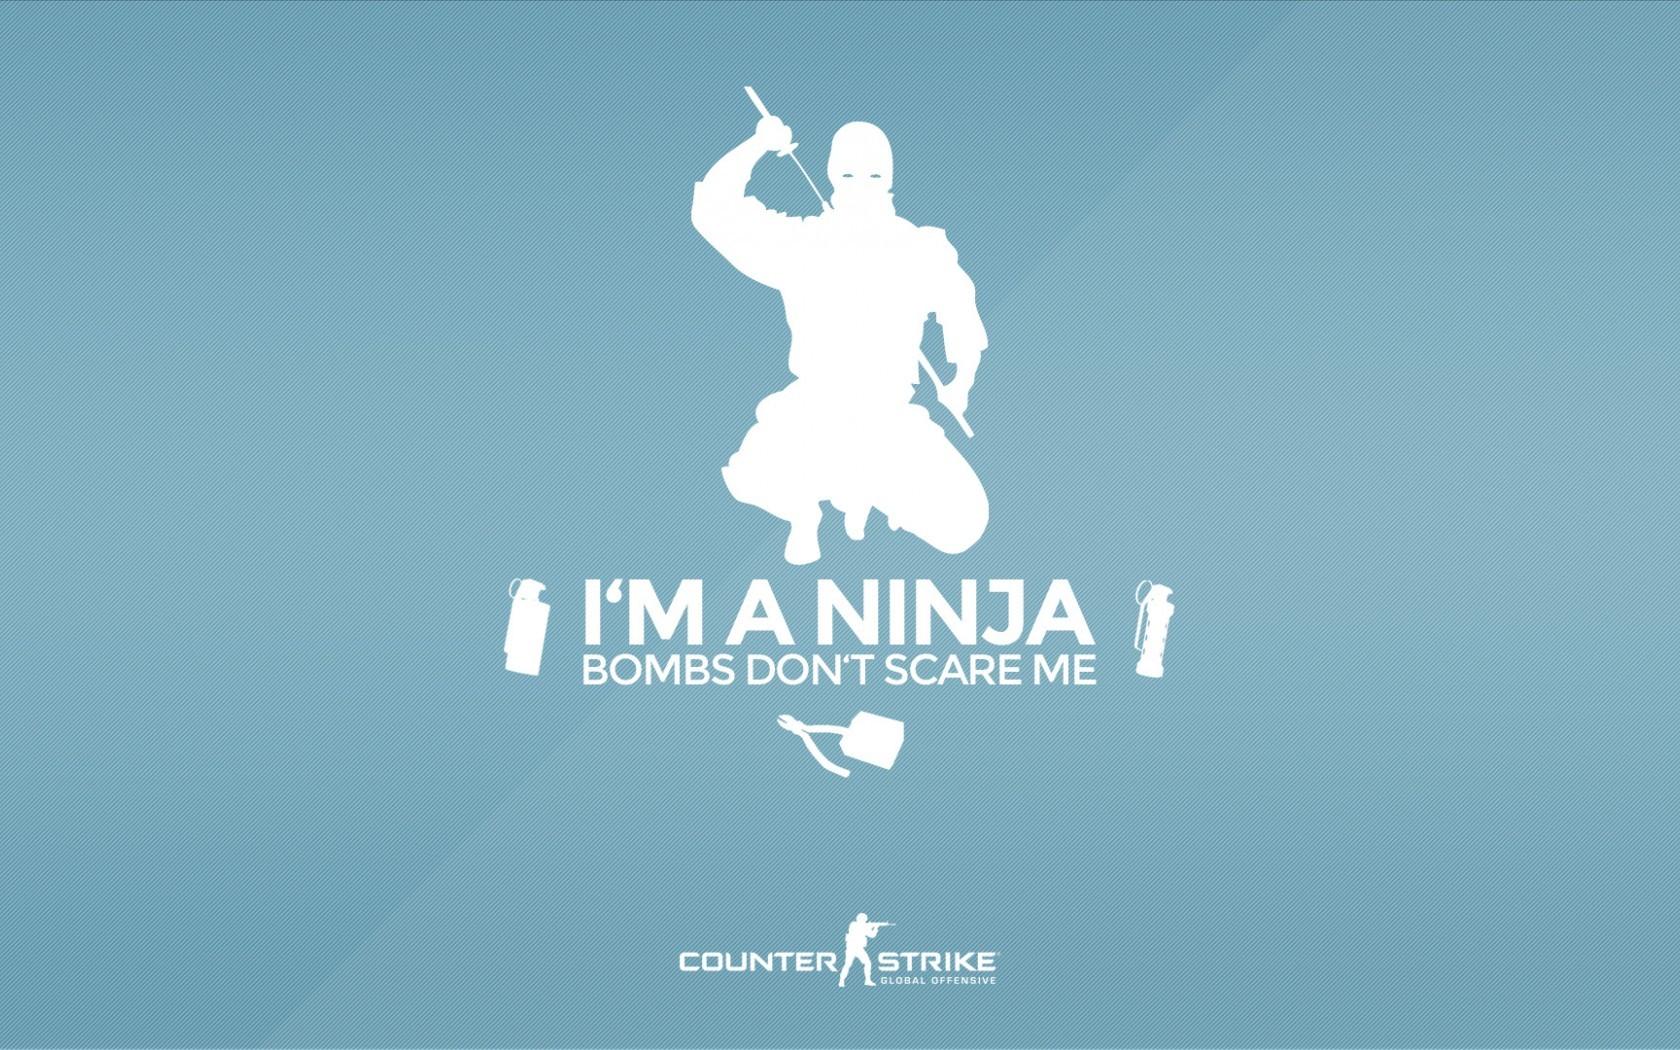 Illustration Text Logo Counter Strike Global Offensive Brand Ninja Defuse Advertising Presentation Font